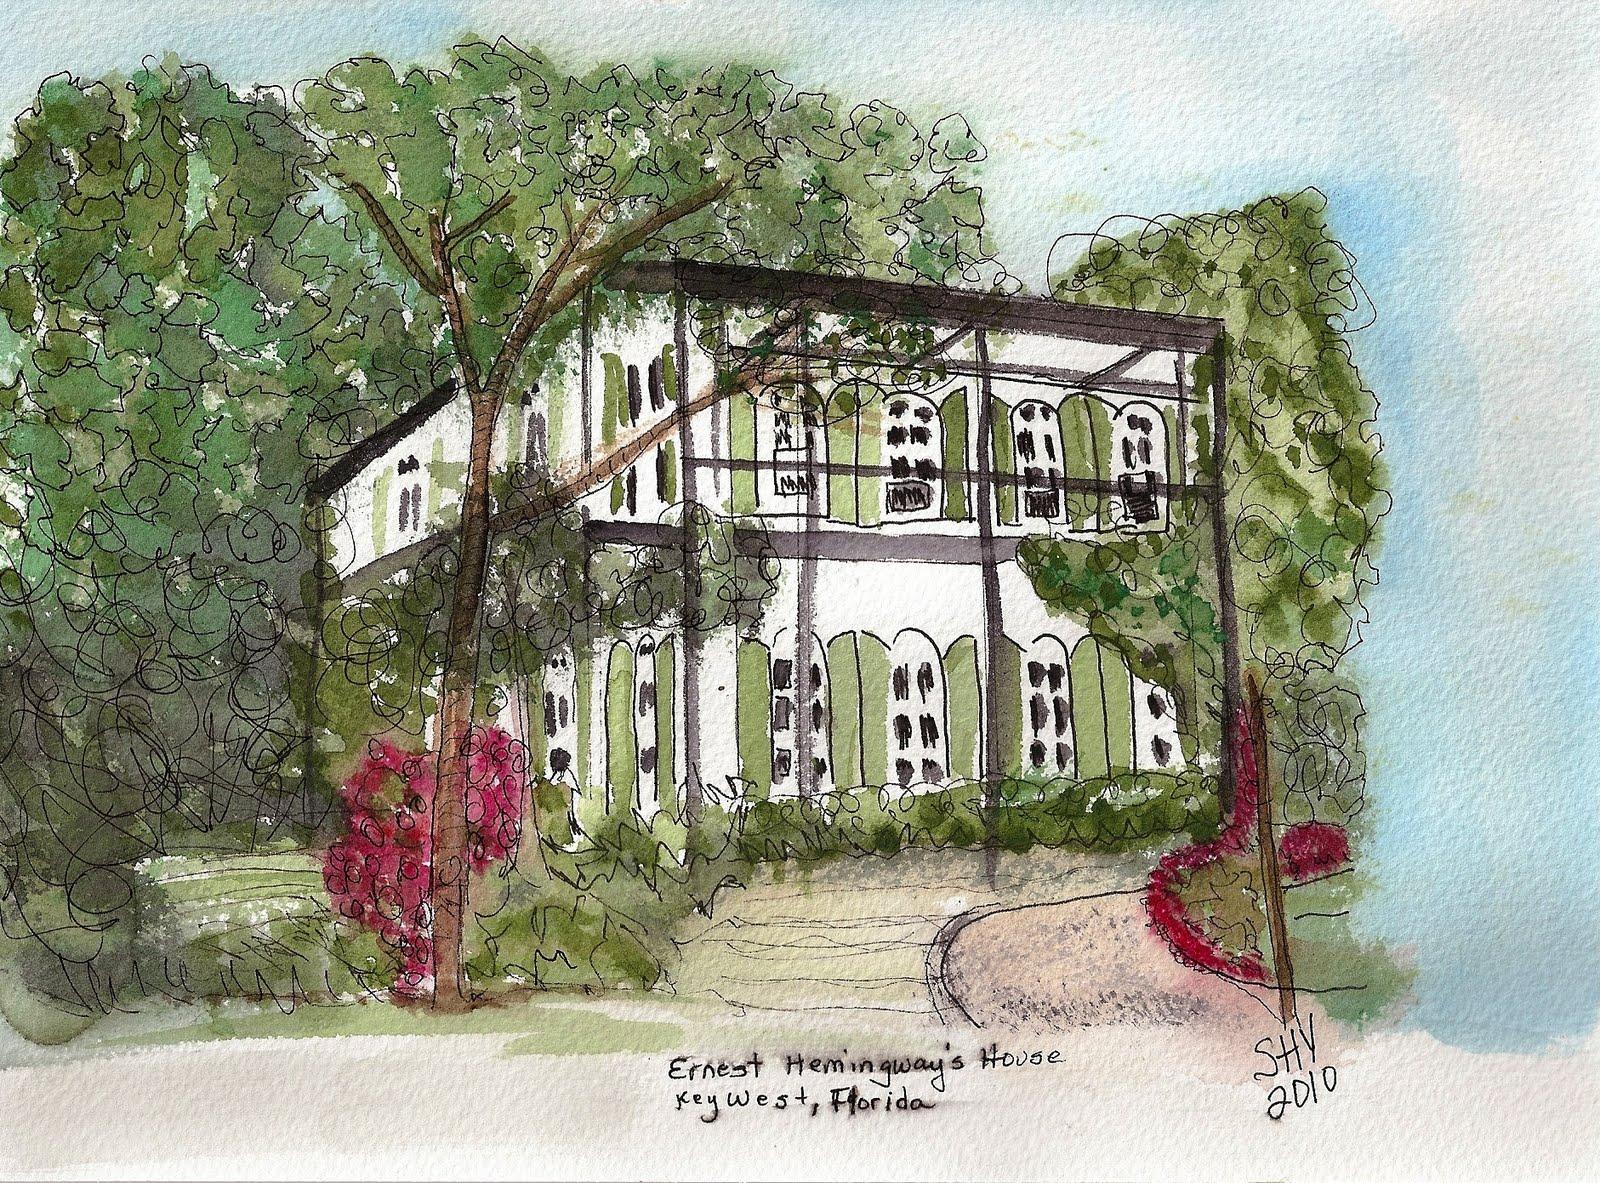 http://1.bp.blogspot.com/_WQbXJmcNP58/TF8uFADHvUI/AAAAAAAAAFE/M5Y1rpwp_dw/s1600/Ernest+Hemingway%27s+House,+Key+West,+Florida+by+SHY.jpg